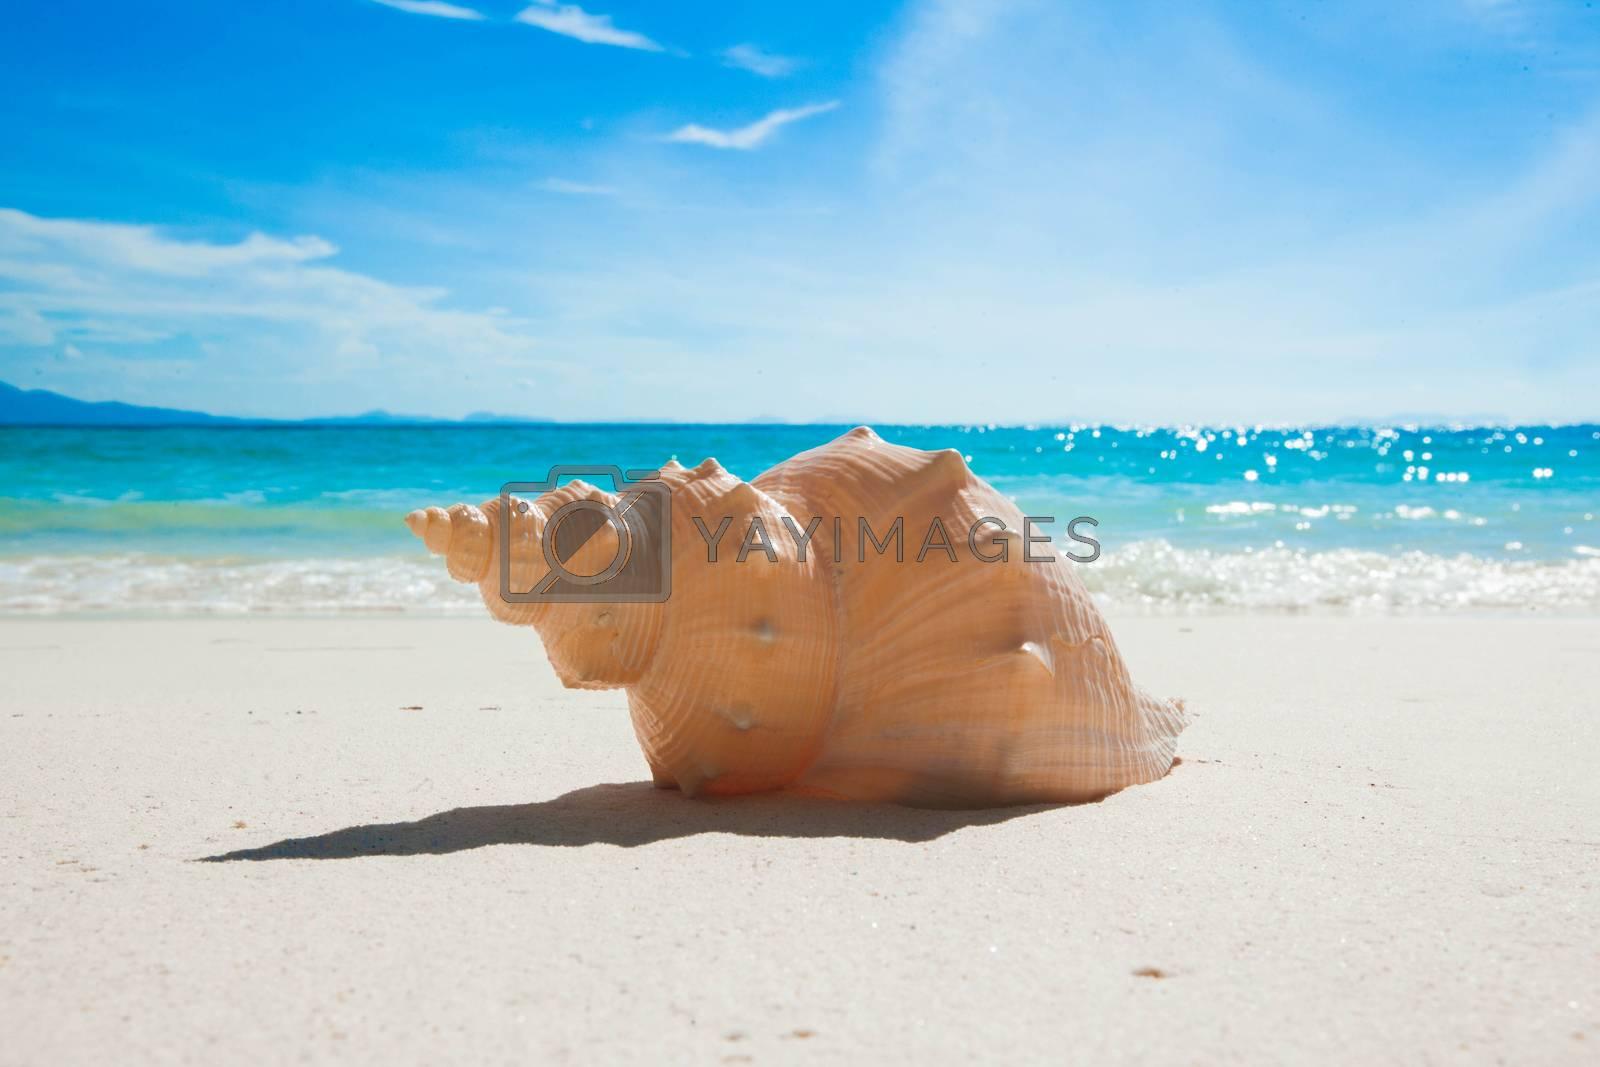 Seashell on sand of tropical sea beach